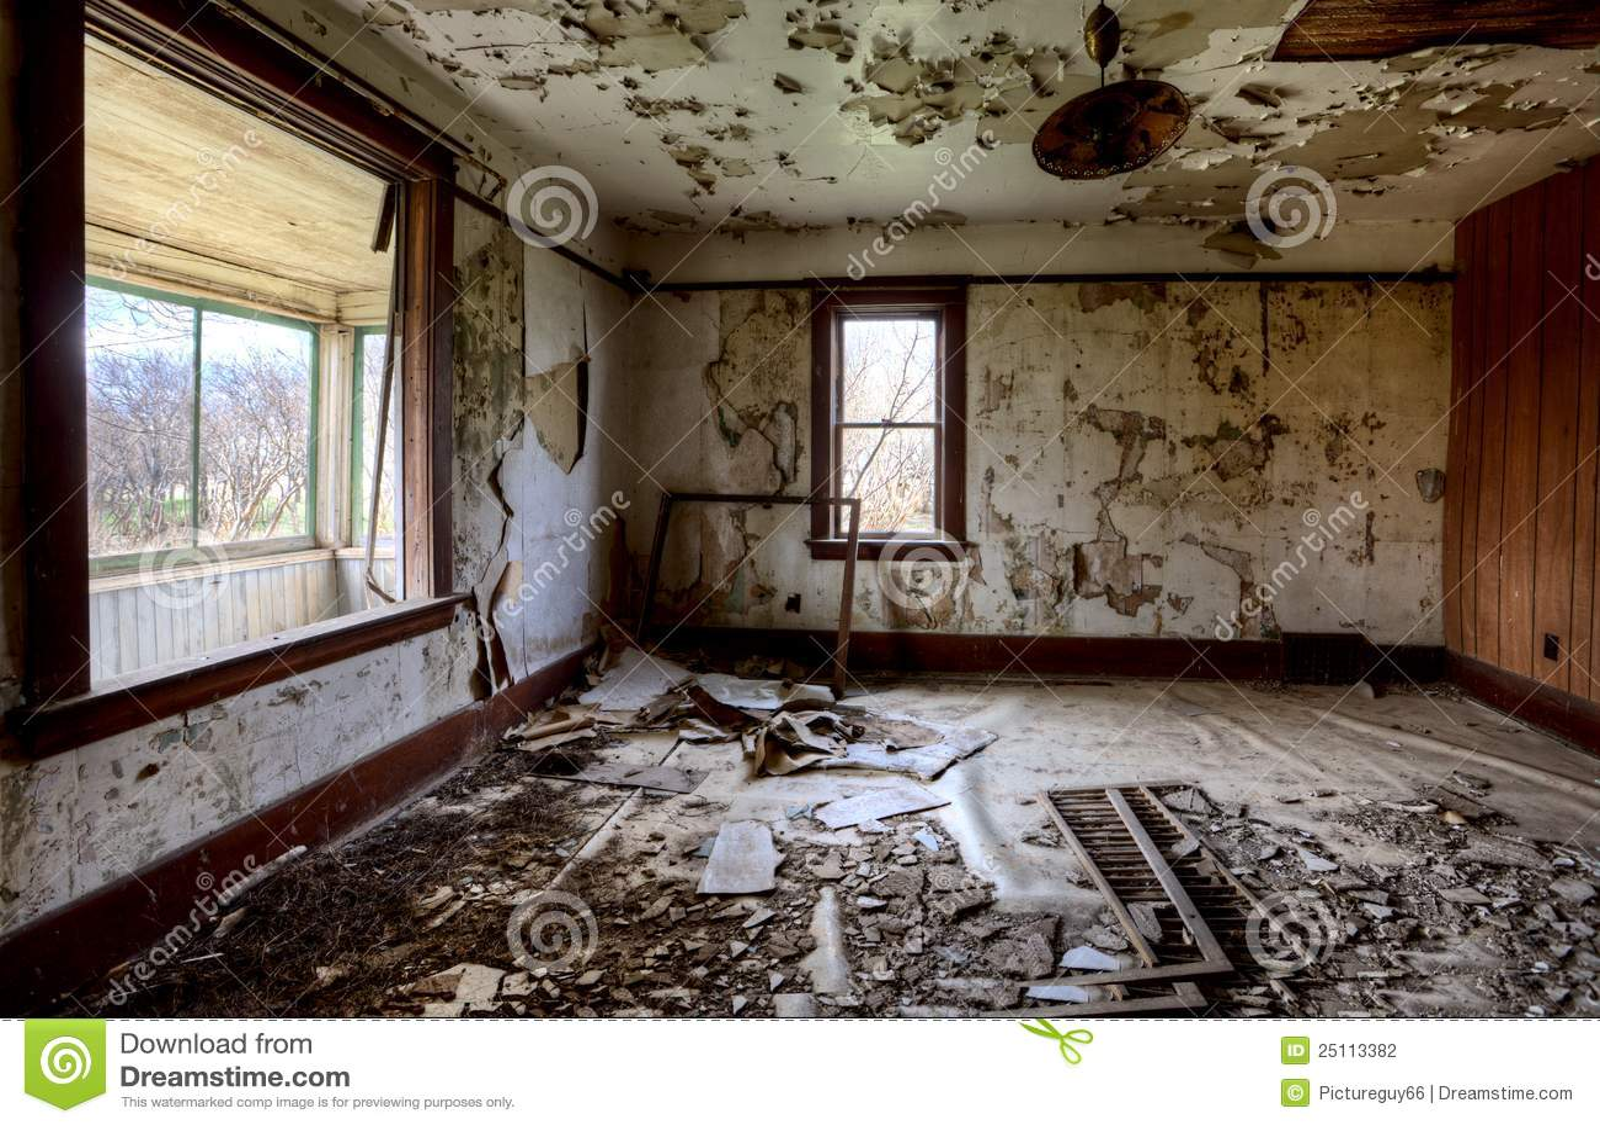 Falling Apart Wallpaper Interior Abandoned House Prairie Stock Photo Image Of